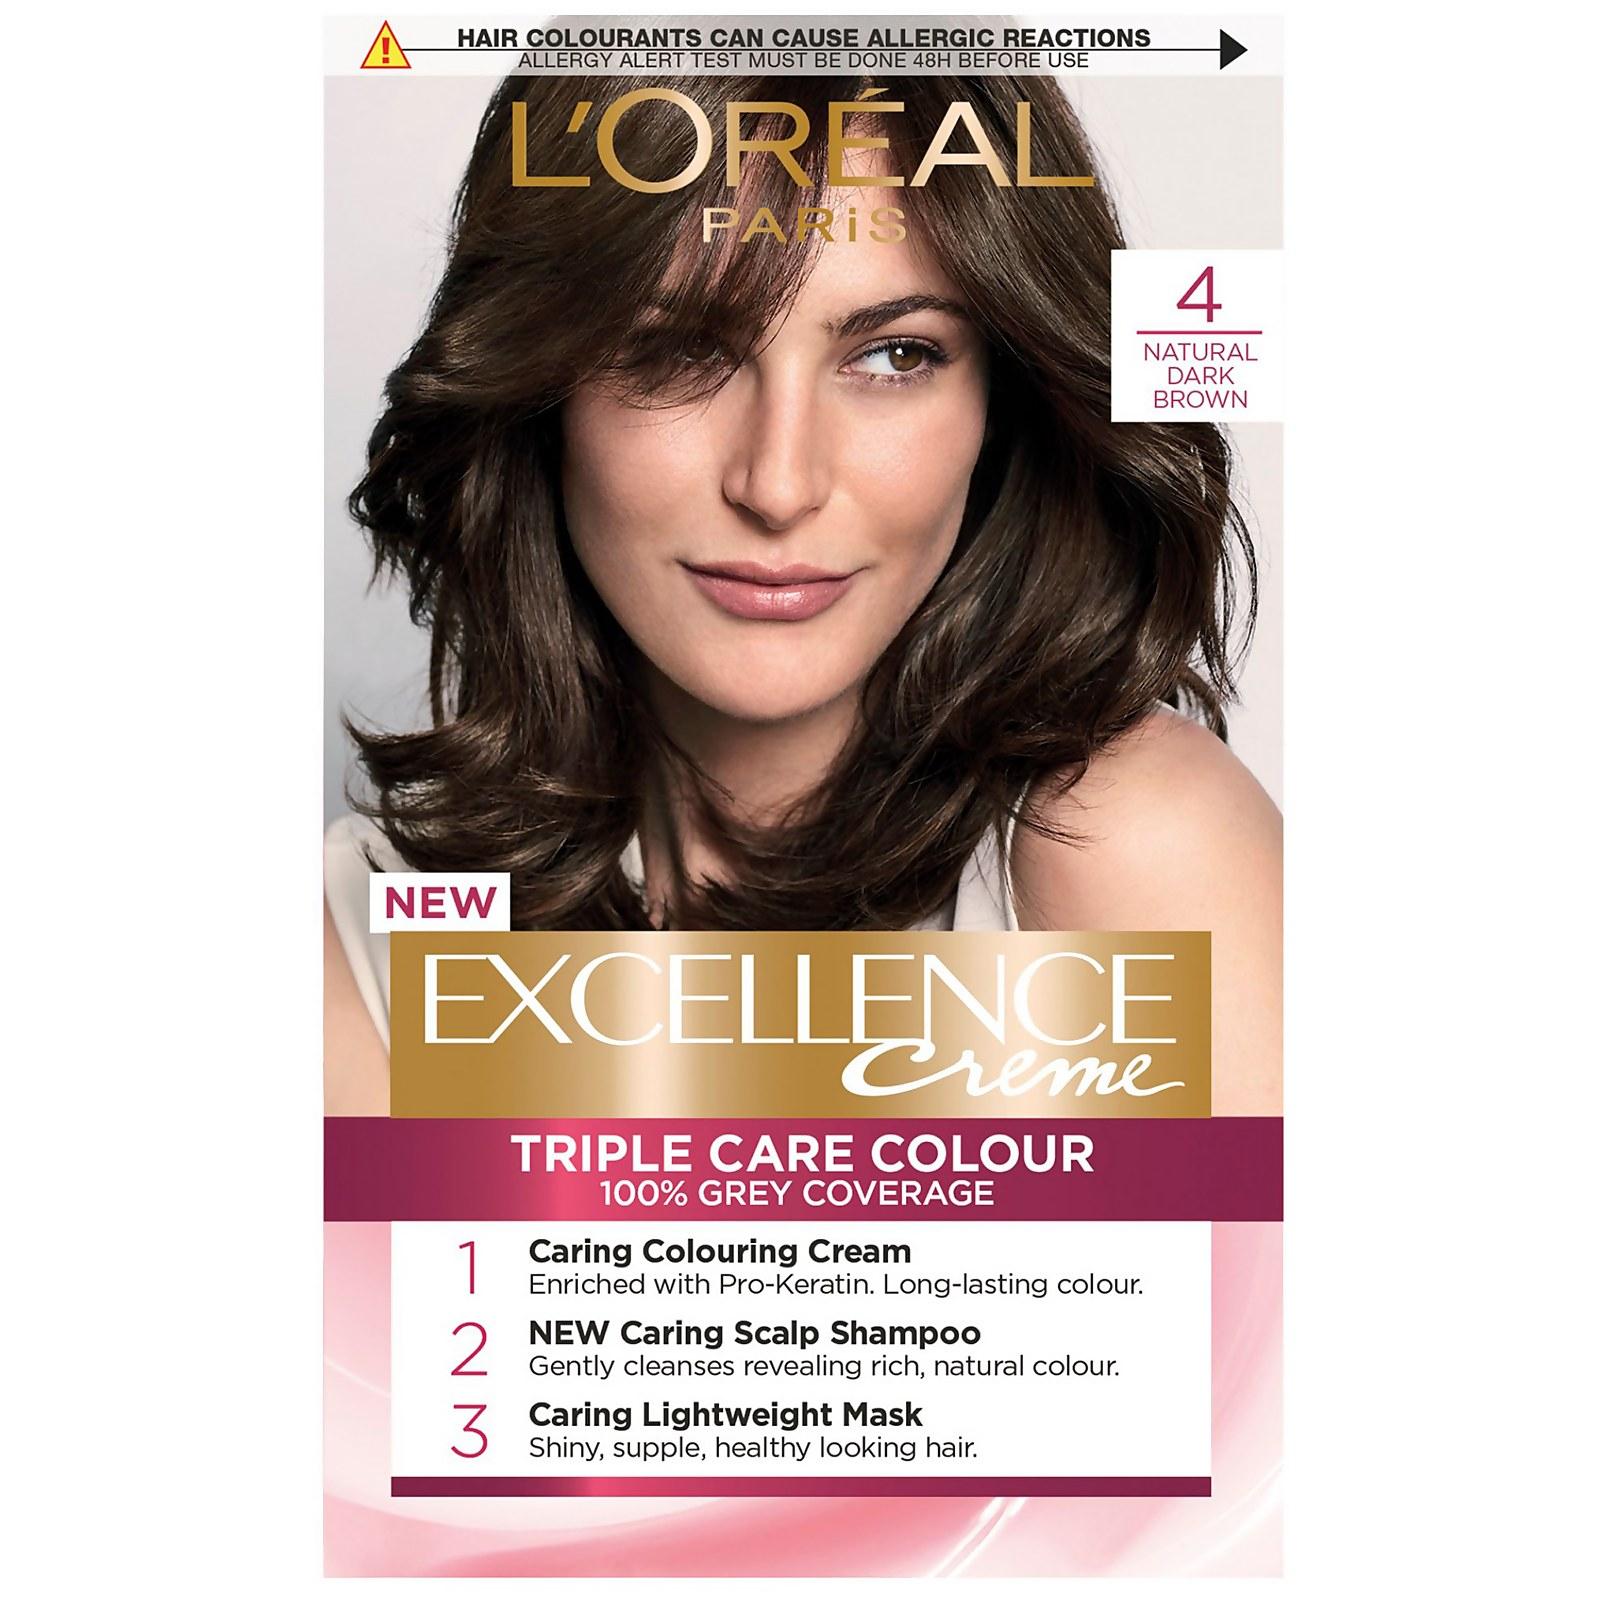 L'Oréal Paris Excellence Crème Permanent Hair Dye (Various Shades) - 4 Natural Dark Brown